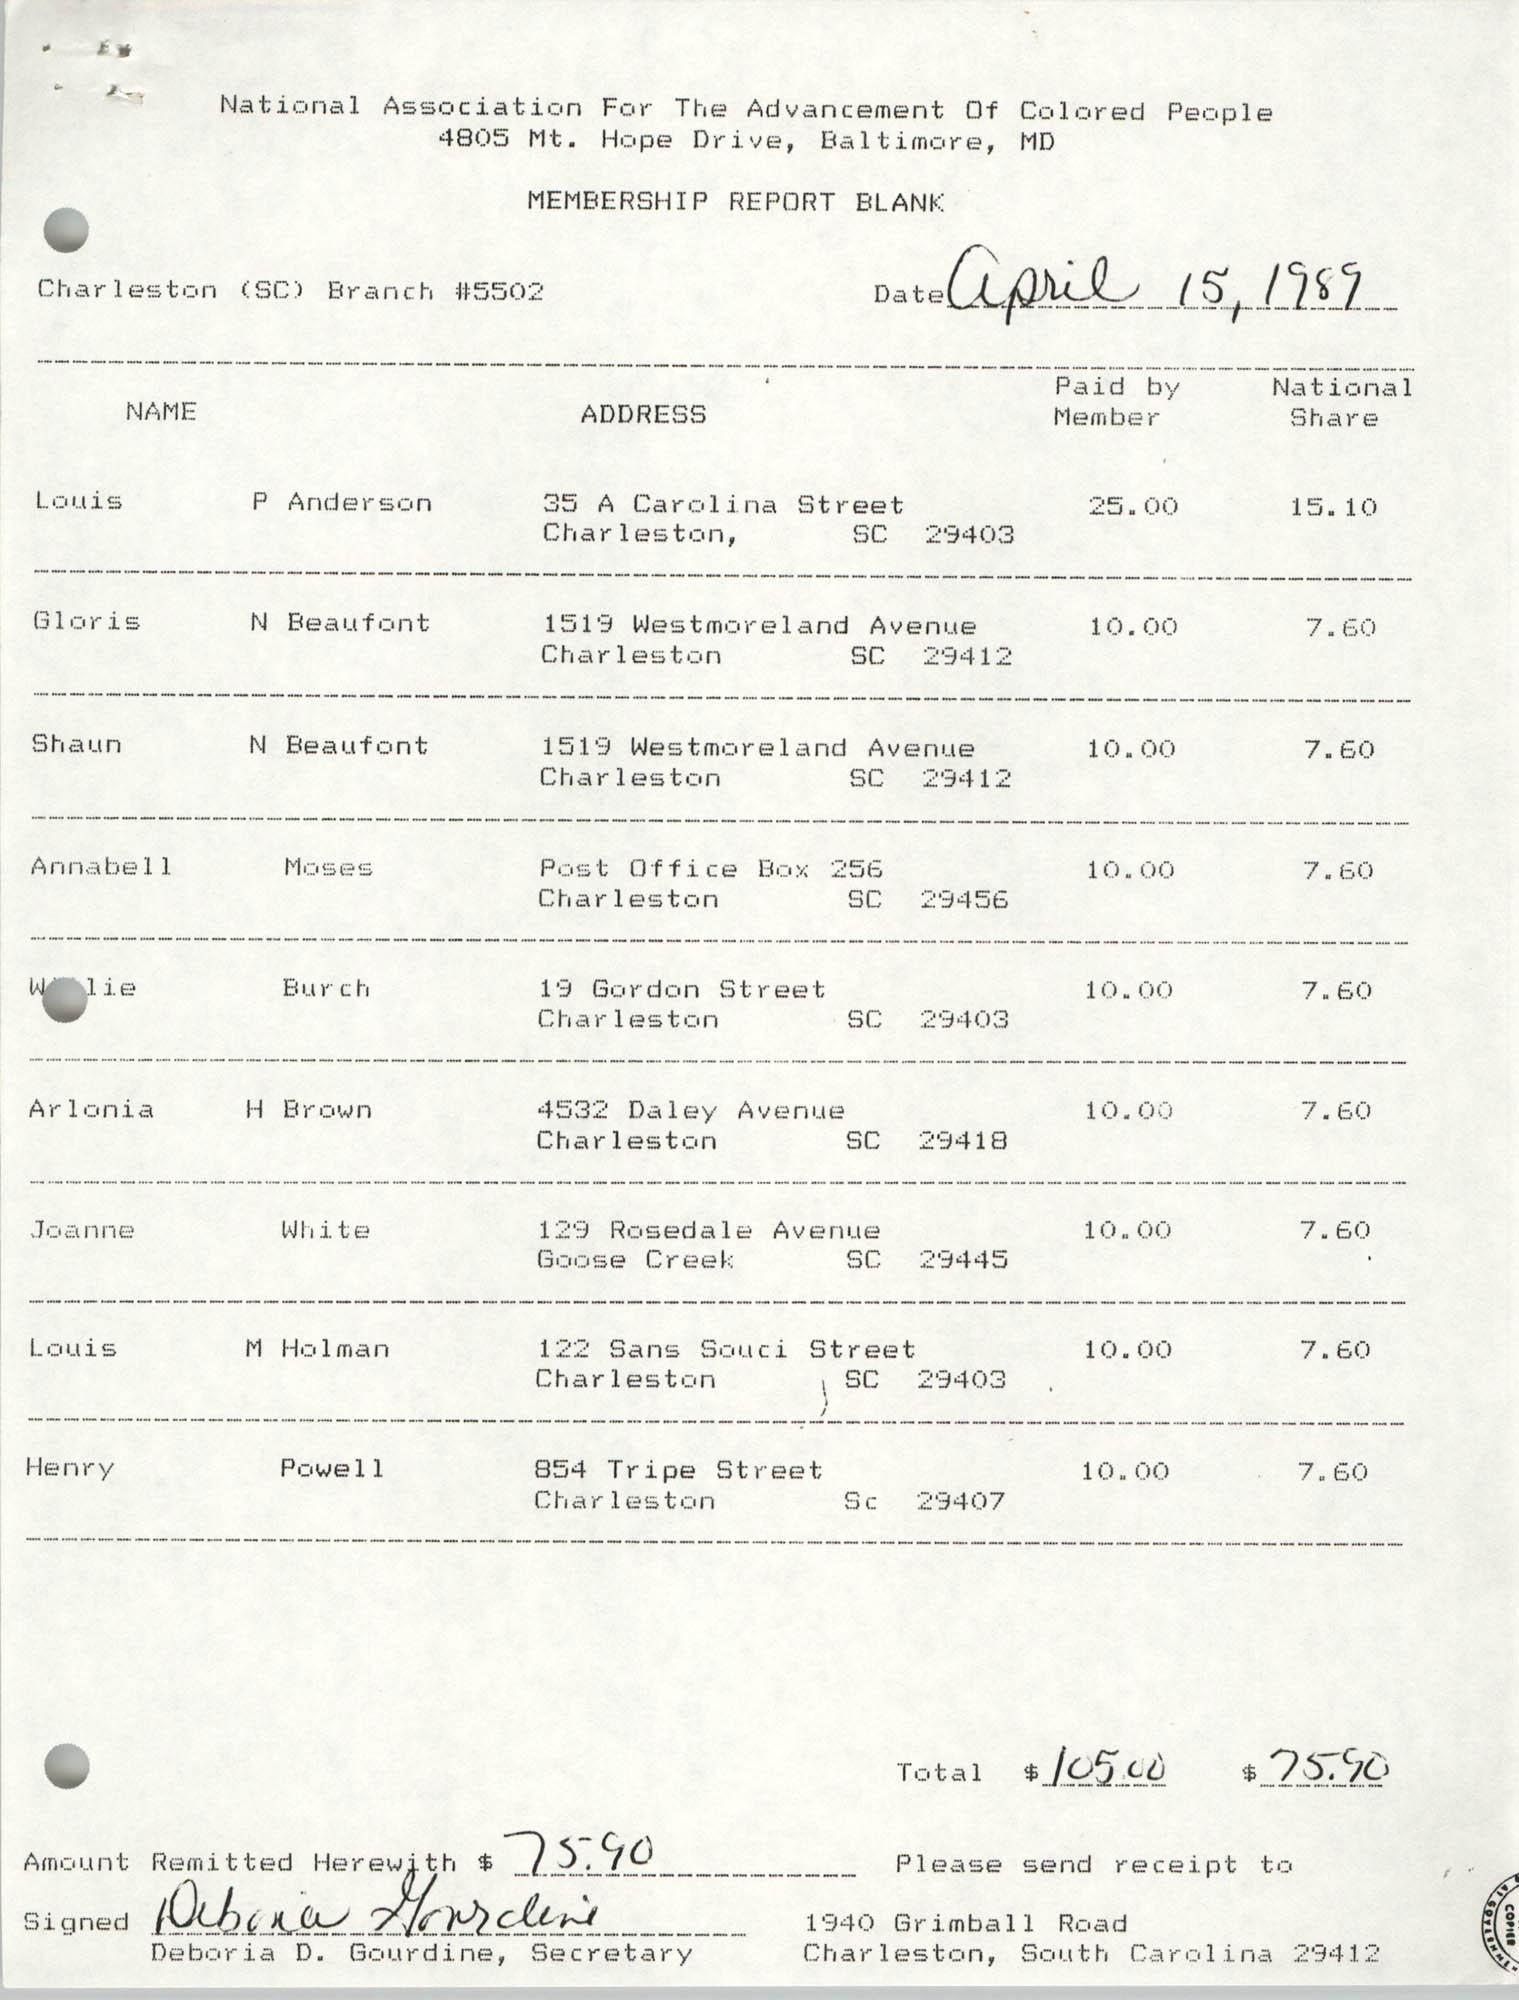 Membership Report Blank, Charleston Branch of the NAACP, Deboria D. Gourdine, April 15, 1989